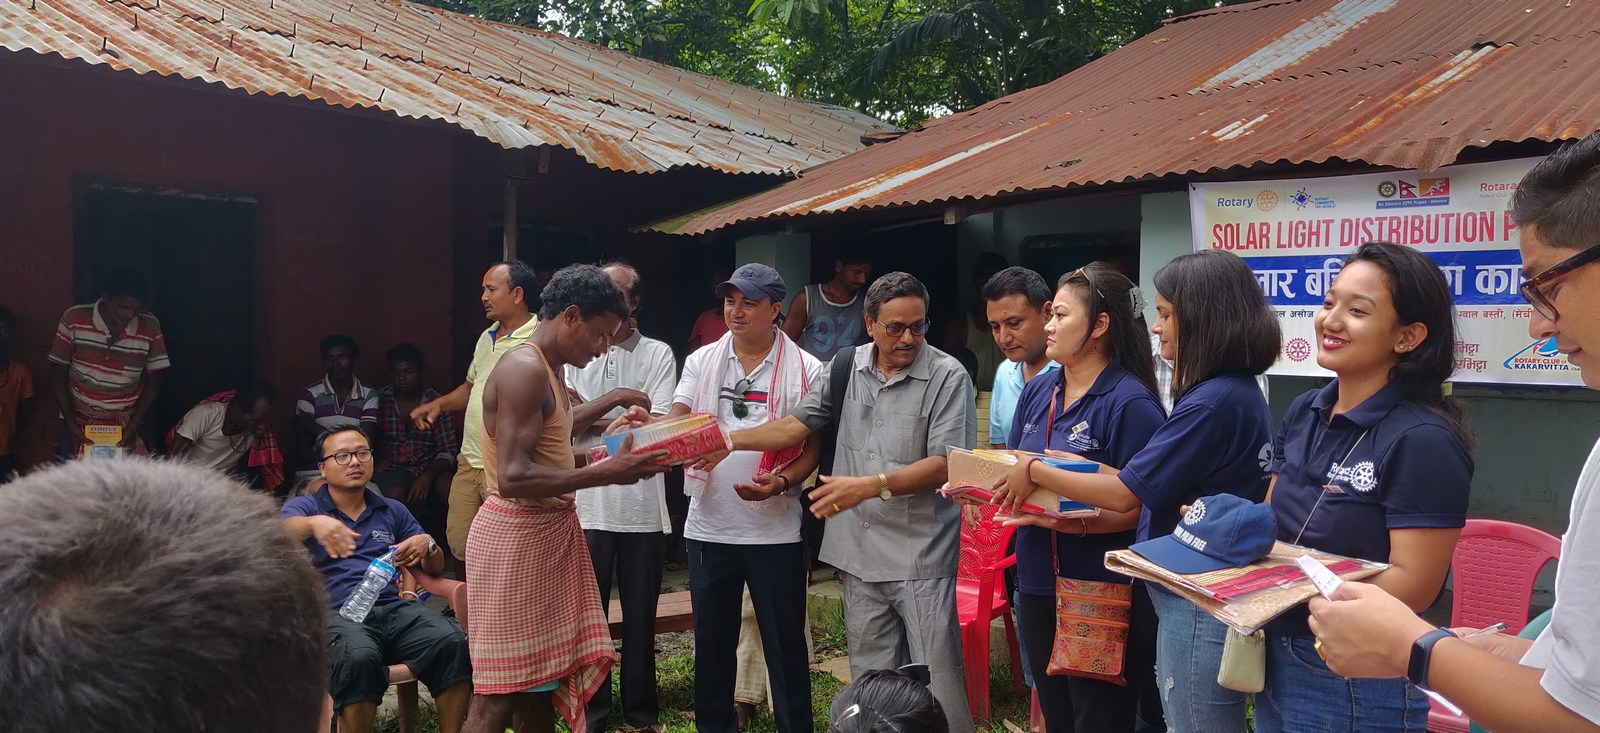 Solar-Light-Distribution-Program-Rotary-Club-of-Kakarvitta-7